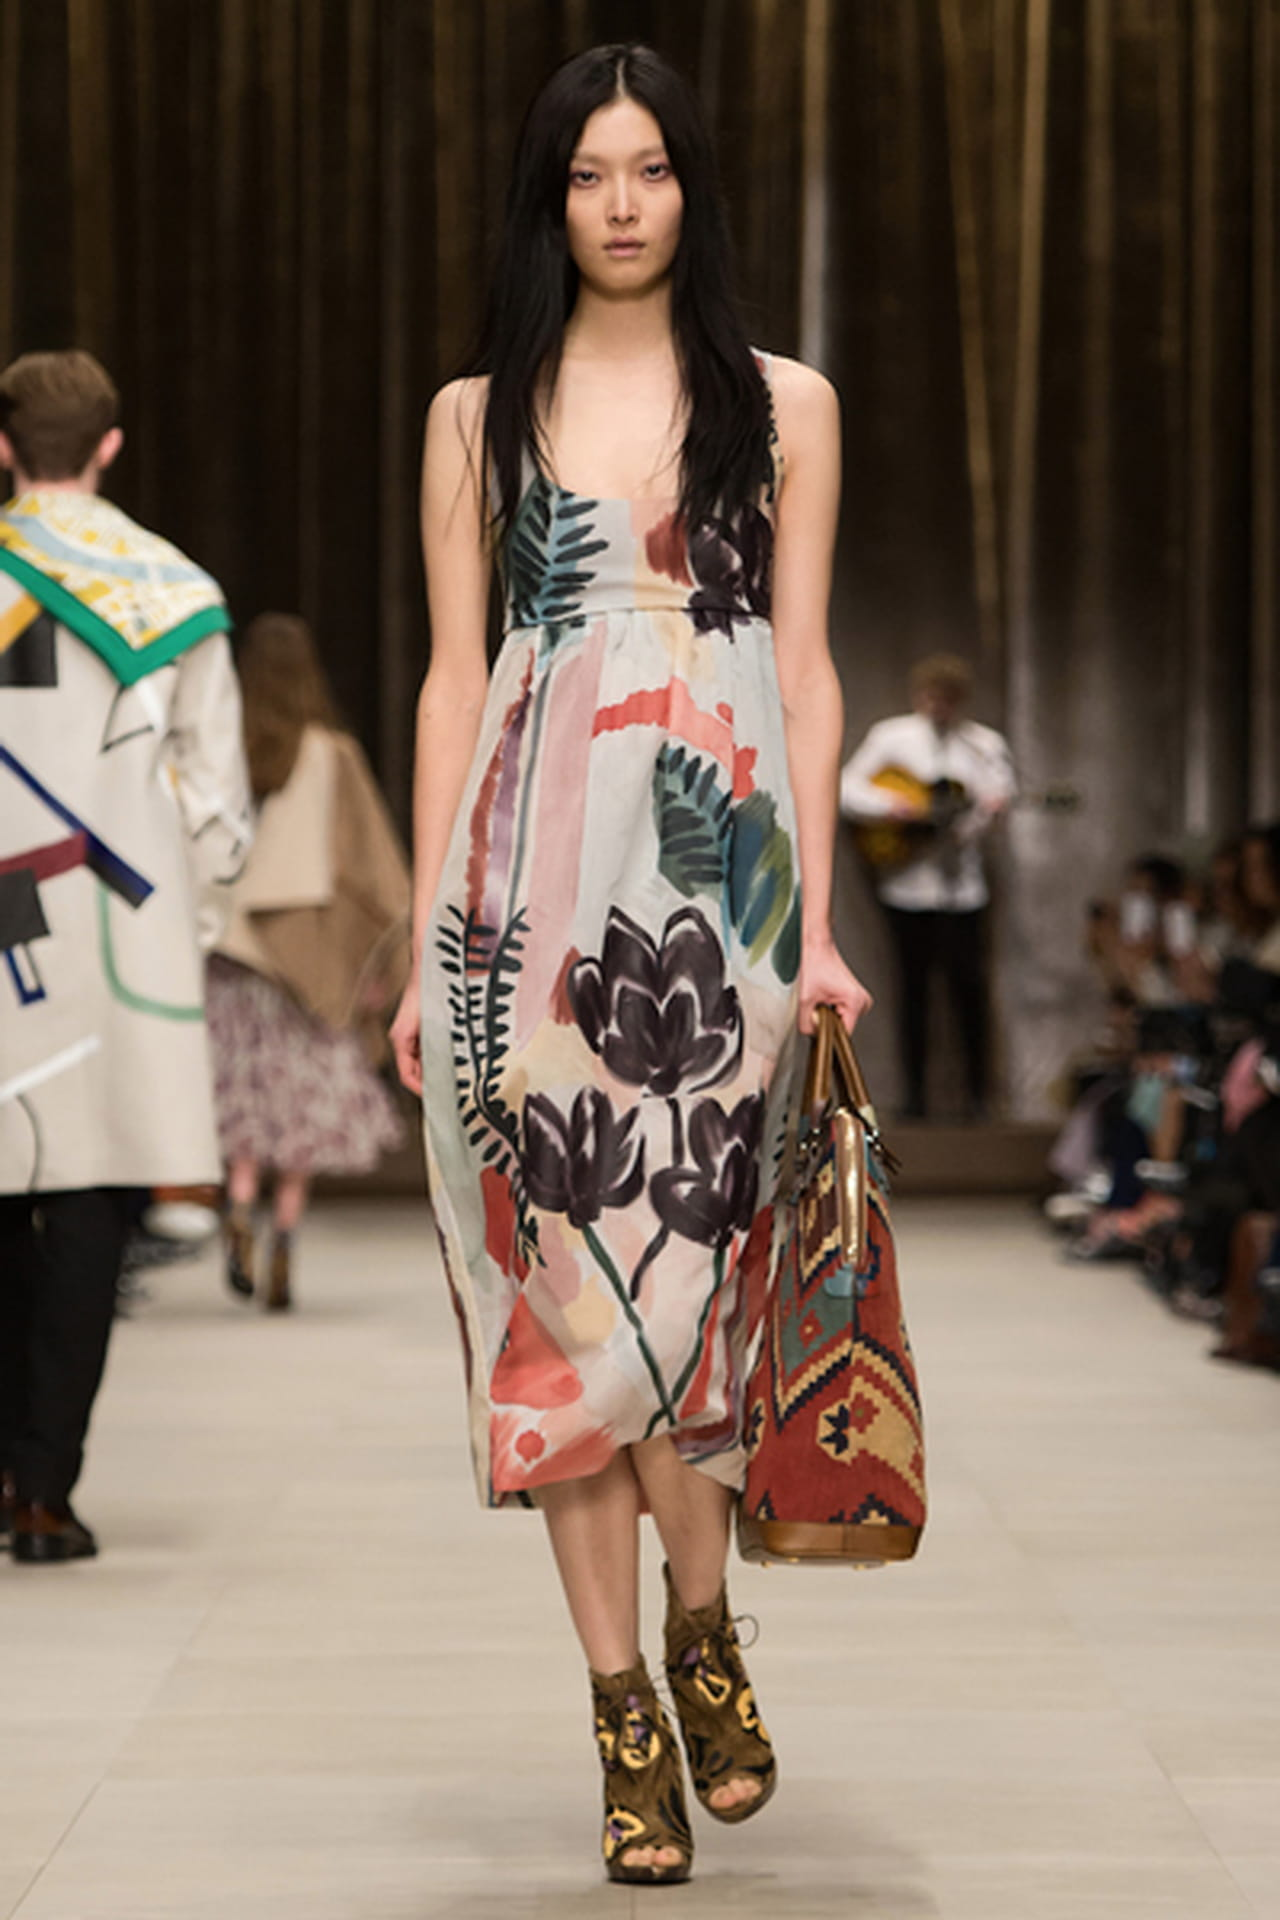 a1b6abf9c 11 فستان مزين بالورود الخلابة من عروض أزياء 2014